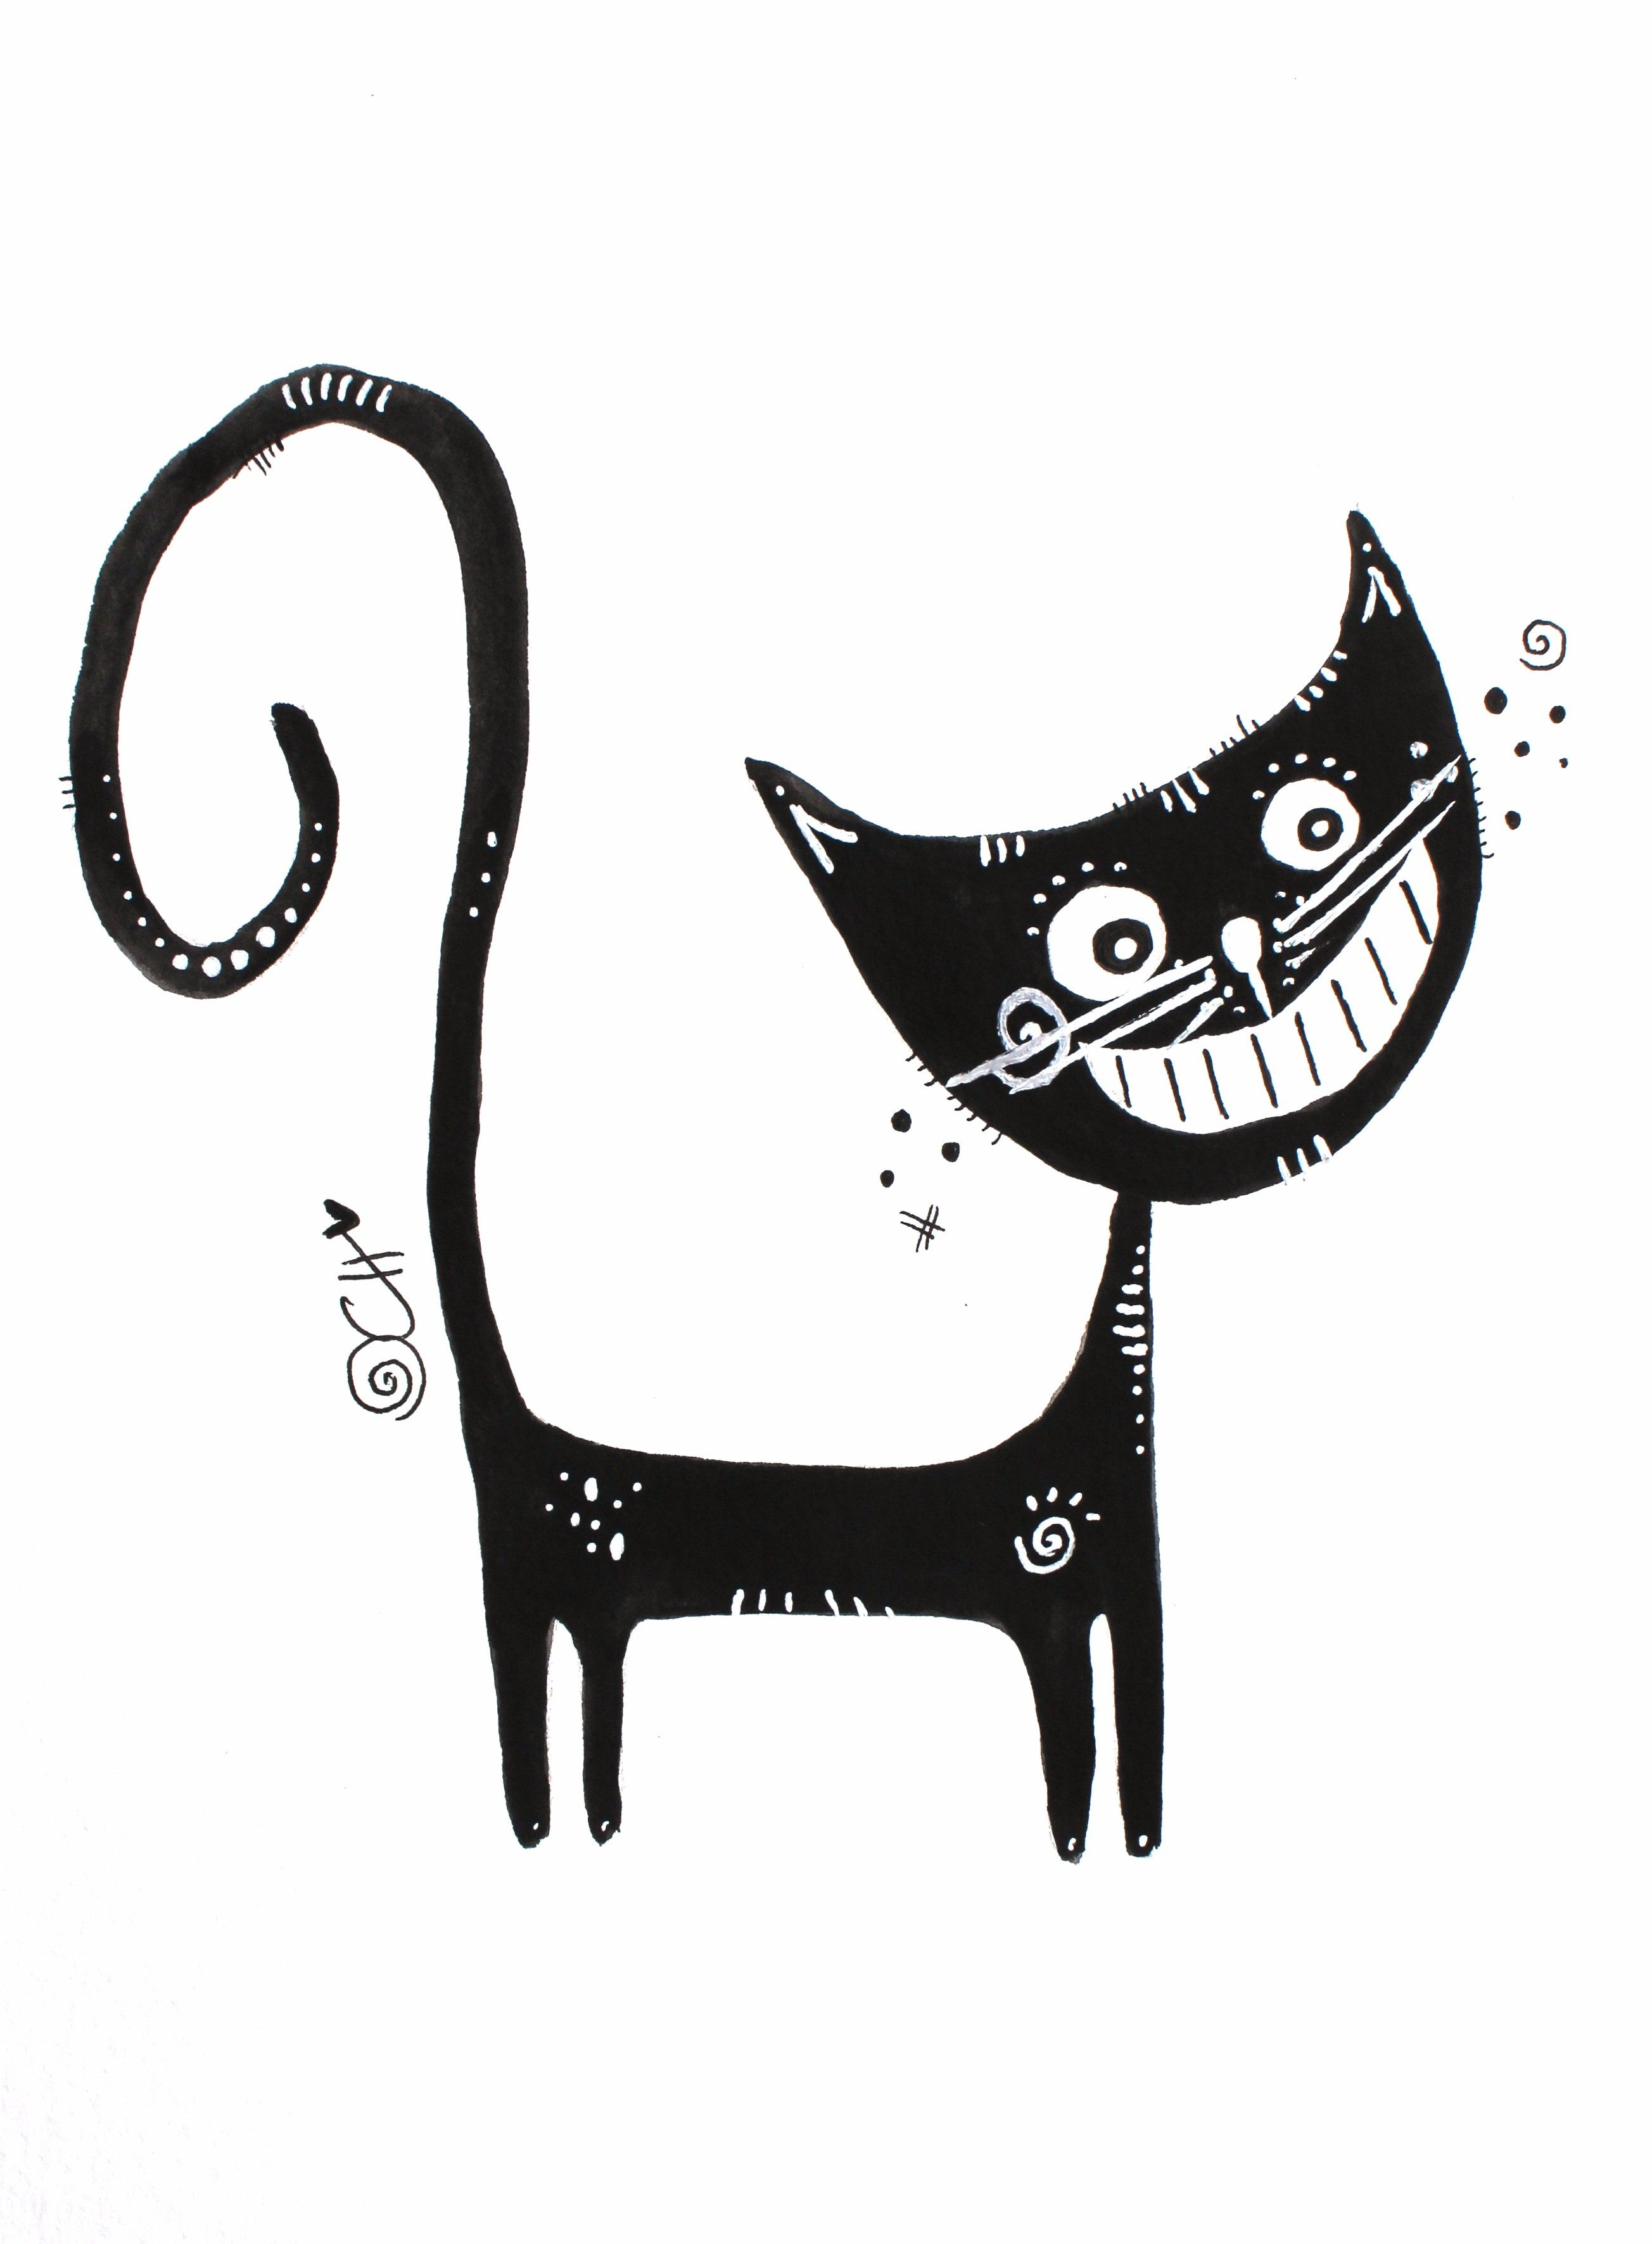 Ausmalbilder Rosina Wachtmeister Katzen : Lebensfreude Durch Kreativit T Fr Hliches Malen Grinsekatze